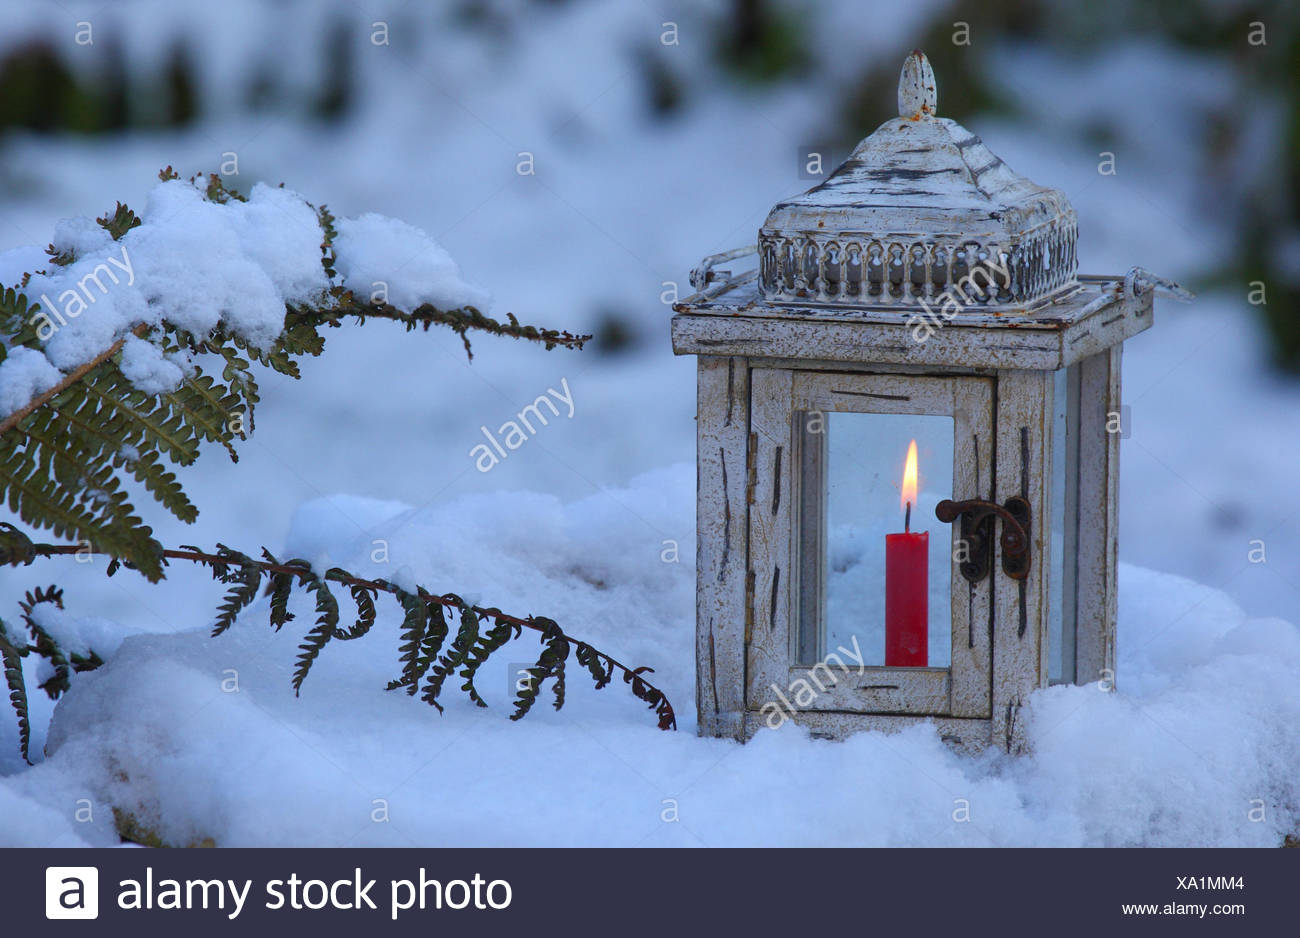 Lantern, candle, burn, snow, candlelight, flame, garden, lamp, light, winter, Gemrany - Stock Image